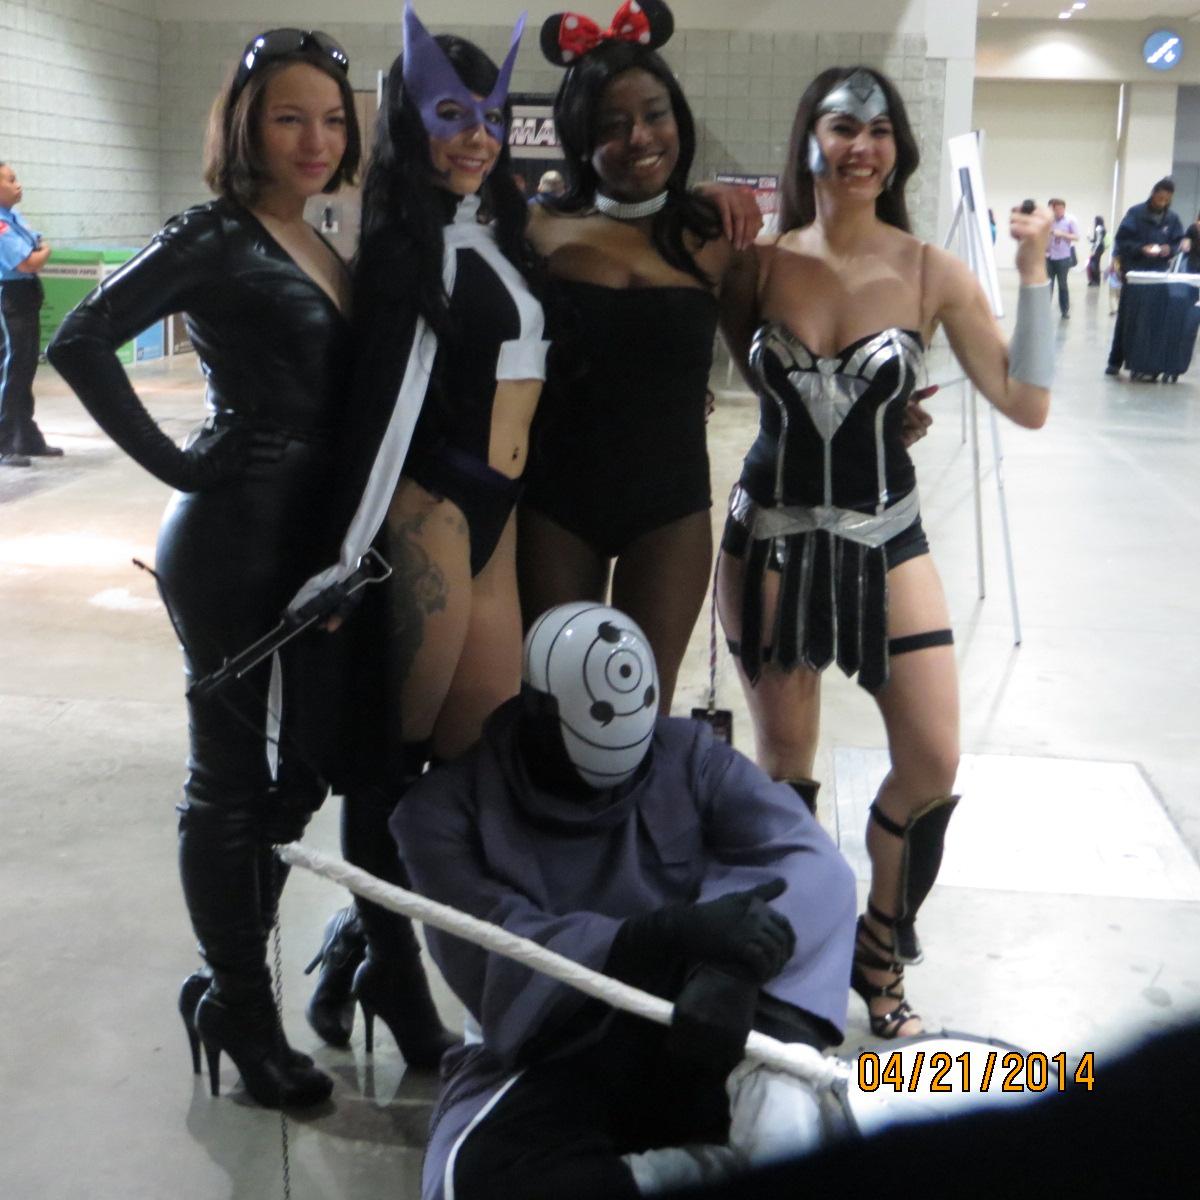 From Left: Ashley O, Catwoman; Nocile J, Huntress; Mercedes McGee, DJ Minnie Mouse; Christina P., Wonder Woman; John Babalola, Orbito (bottom)